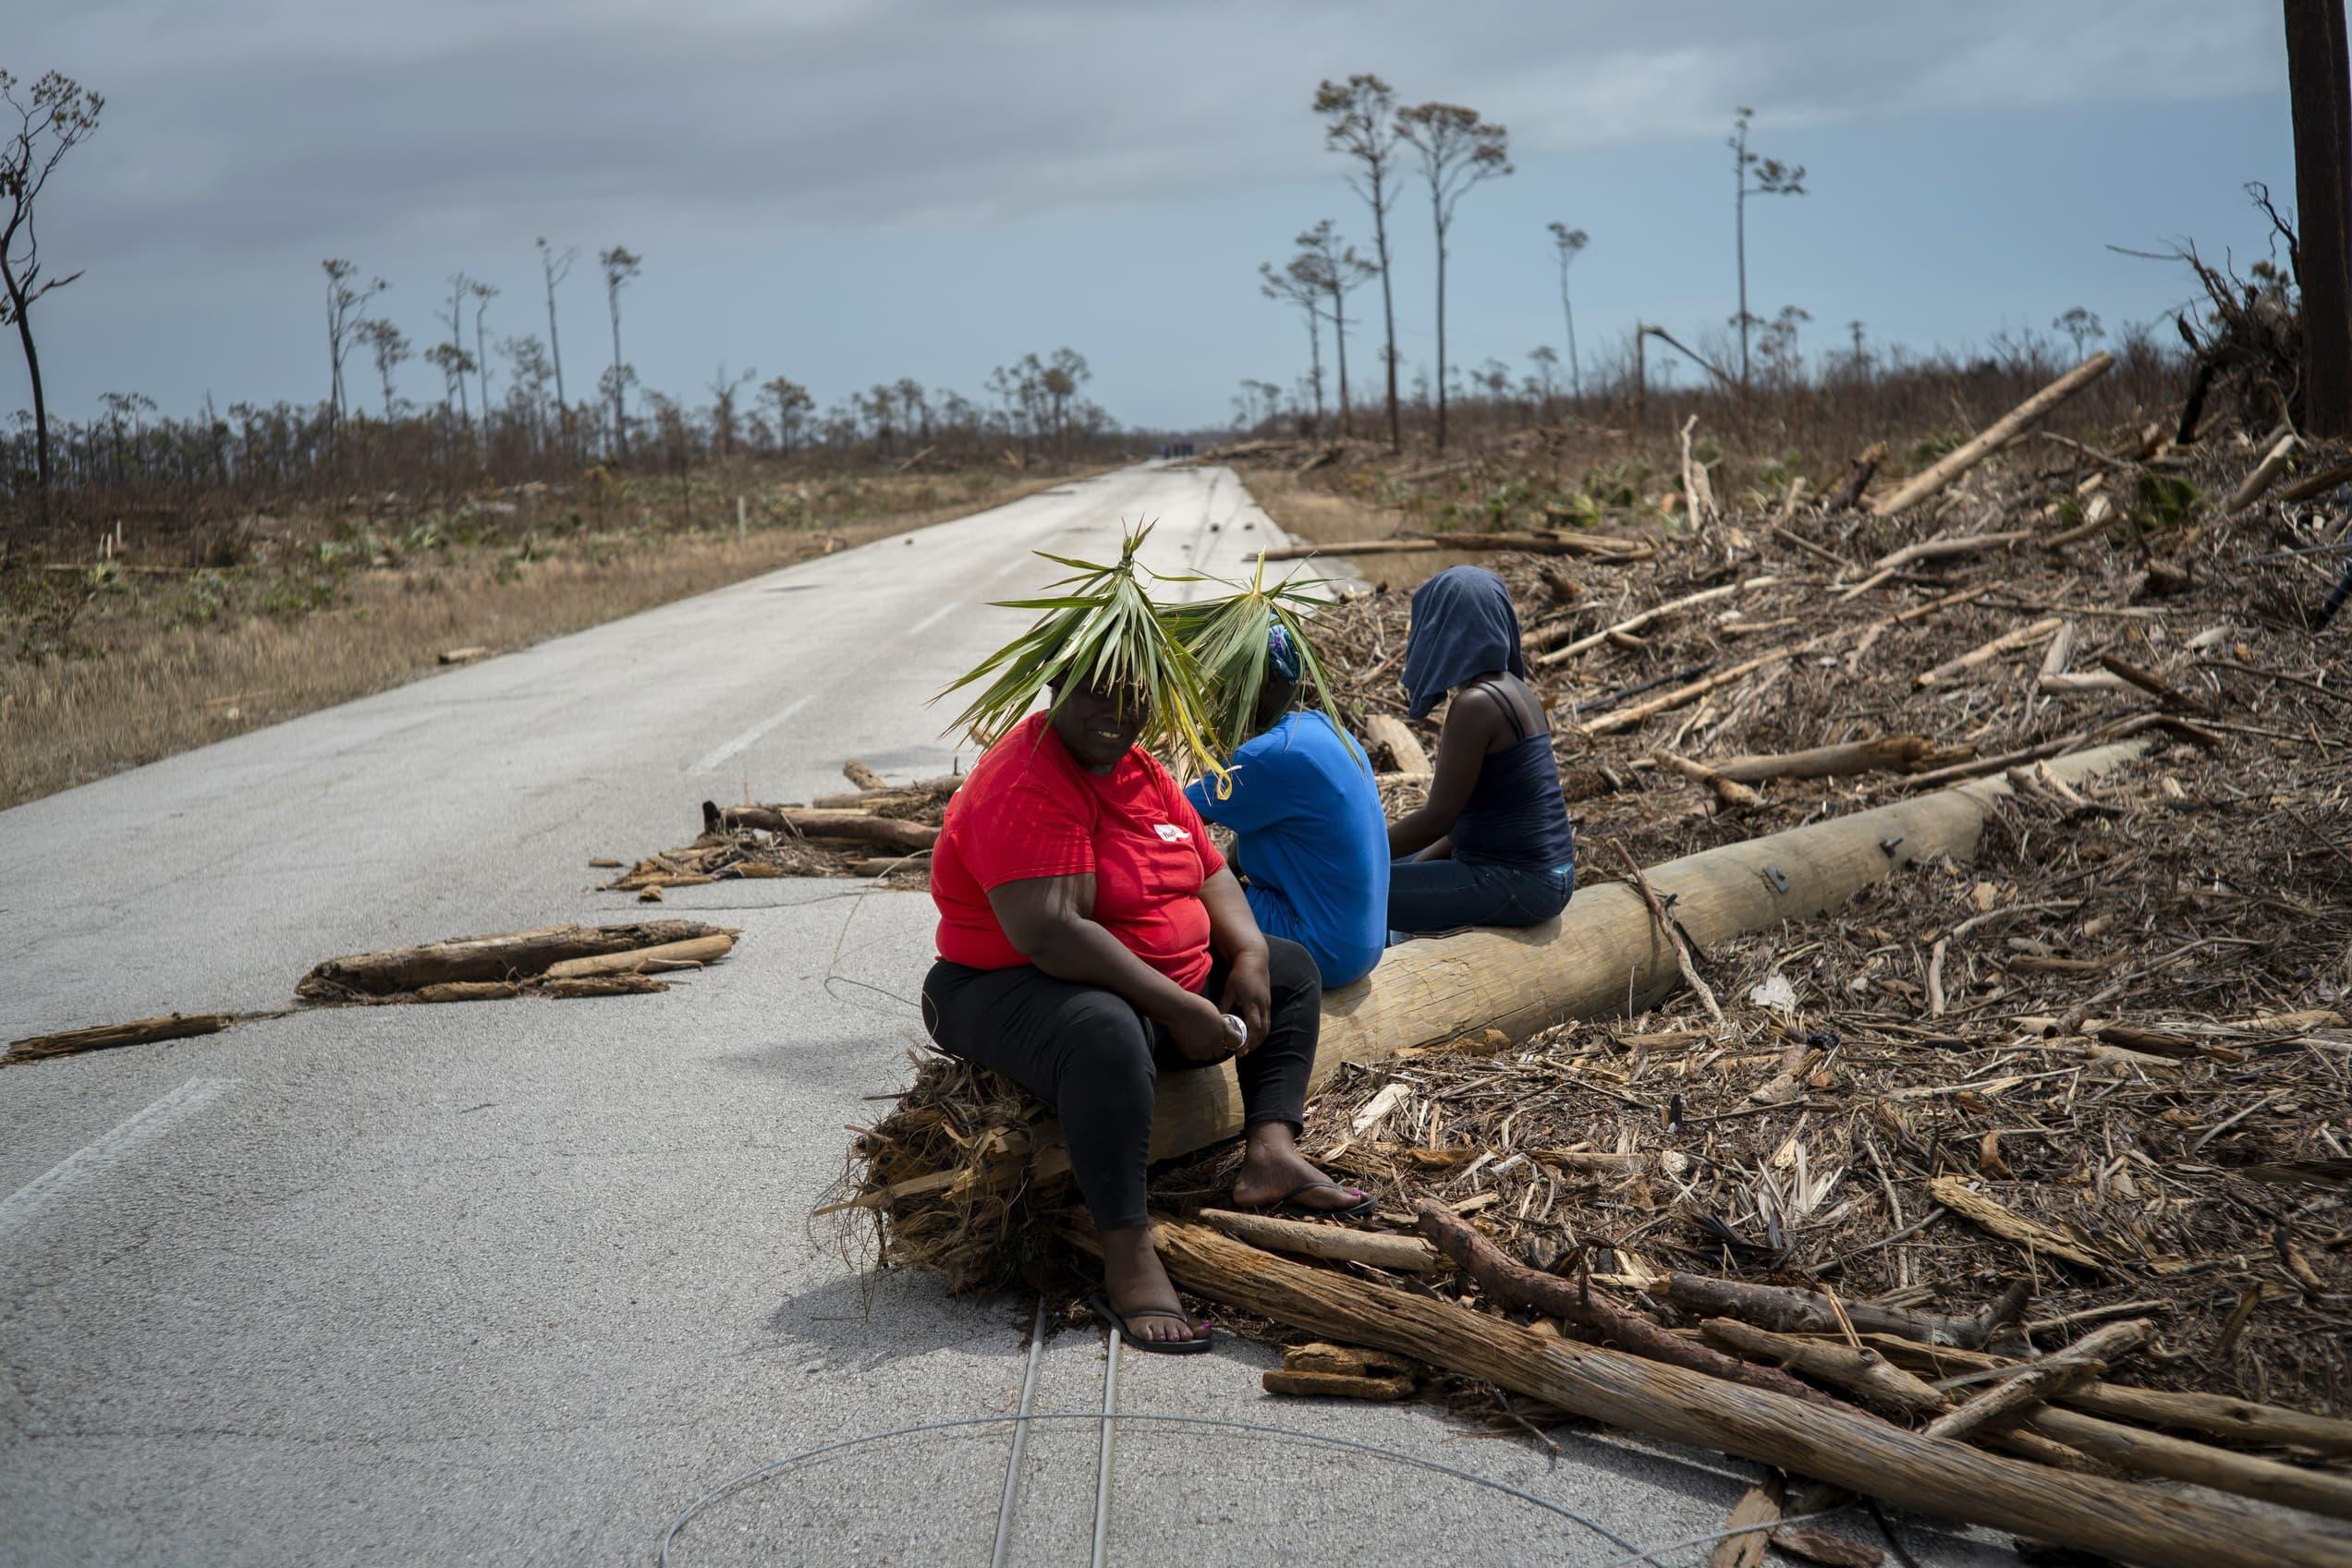 Island nations face 'perfect storm' as coronavirus meets hurricane season